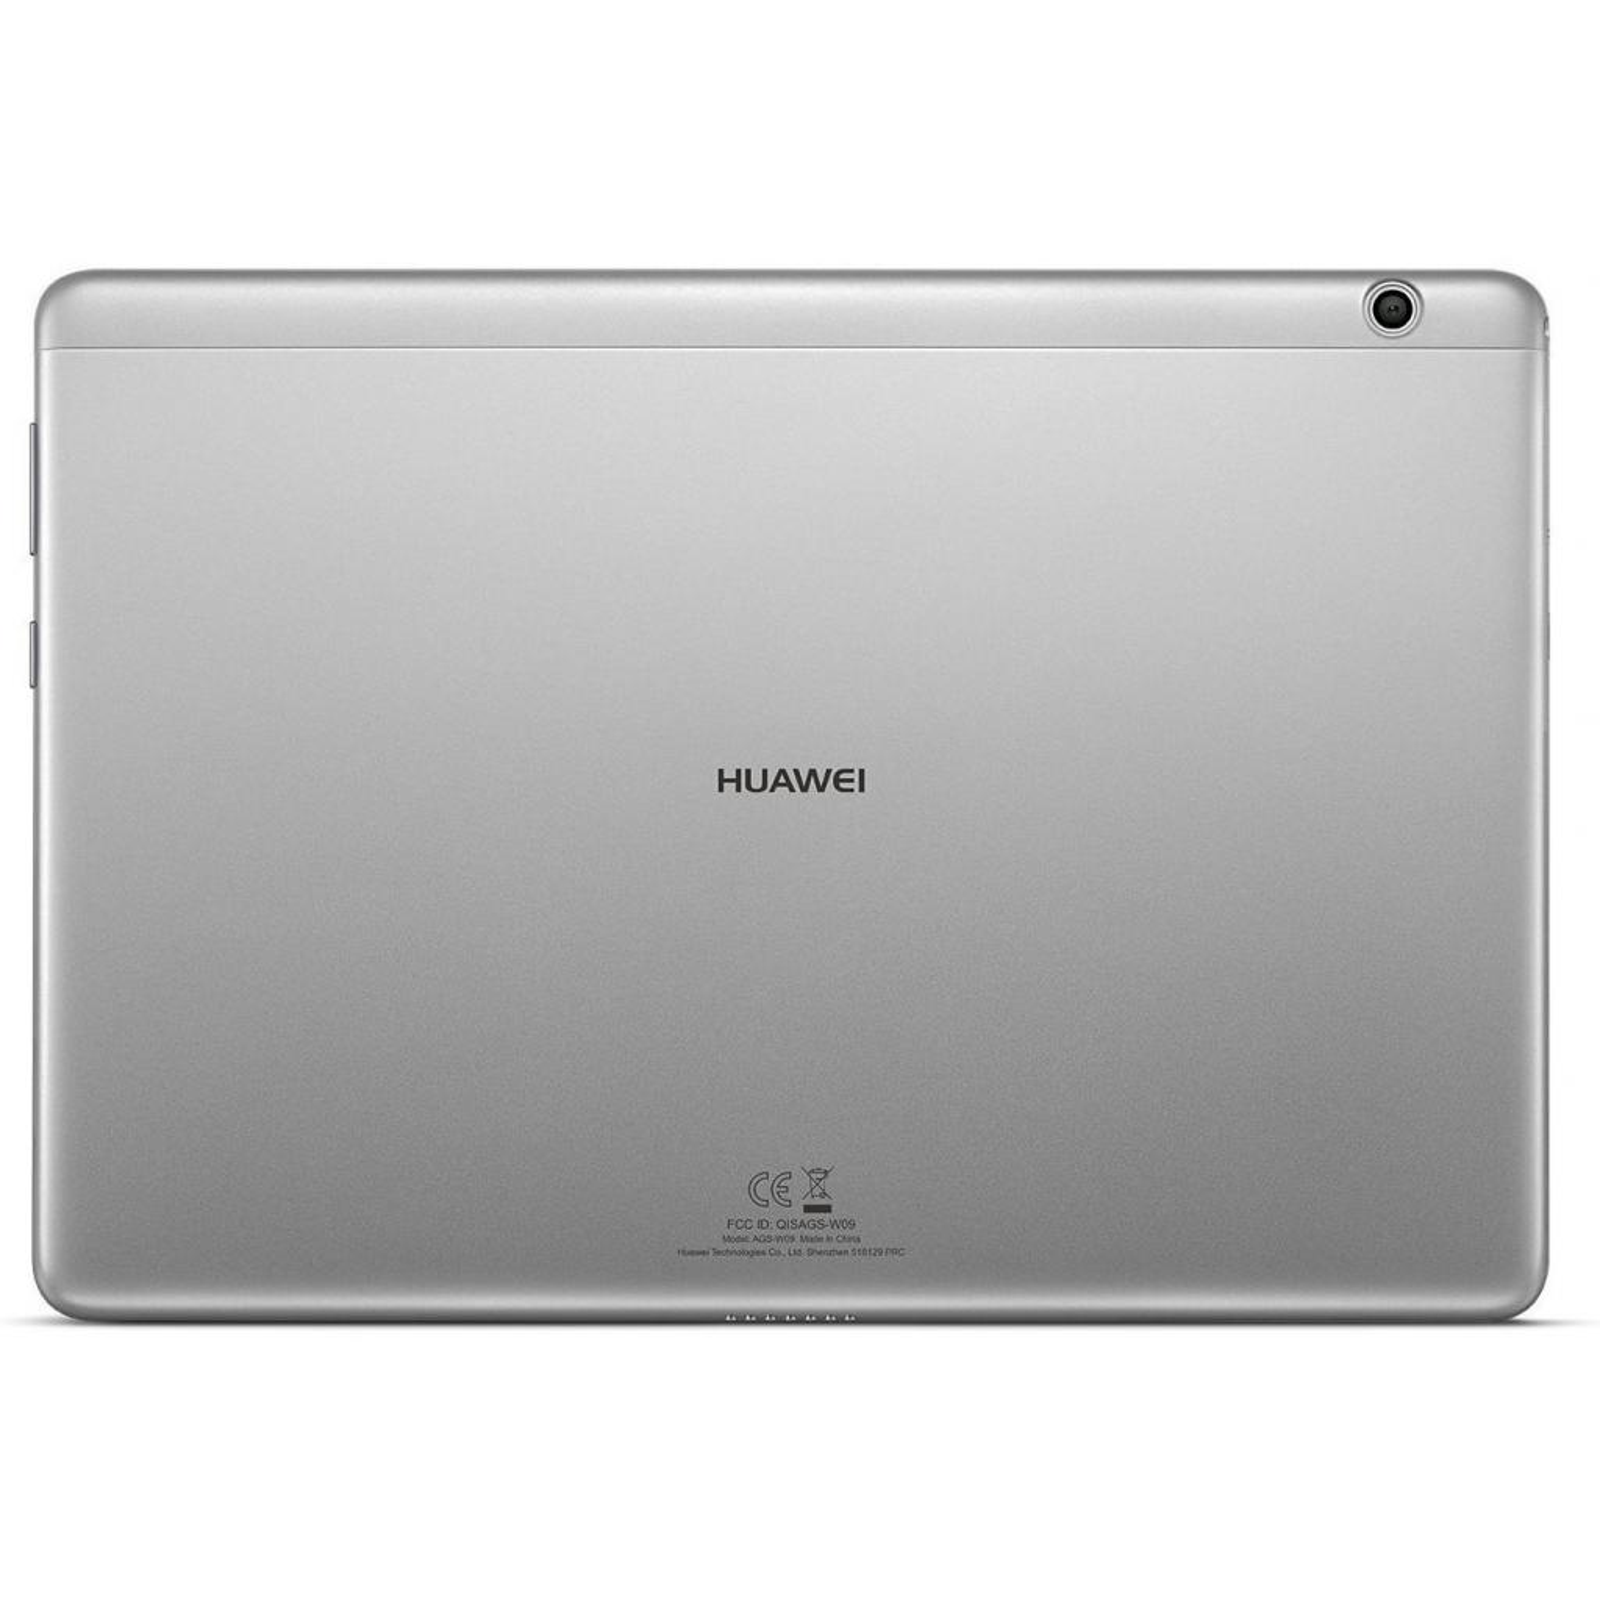 "Планшет Huawei MediaPad T3 10"" Wi-Fi (AGS-W09) Space Grey (53018520) изображение 2"